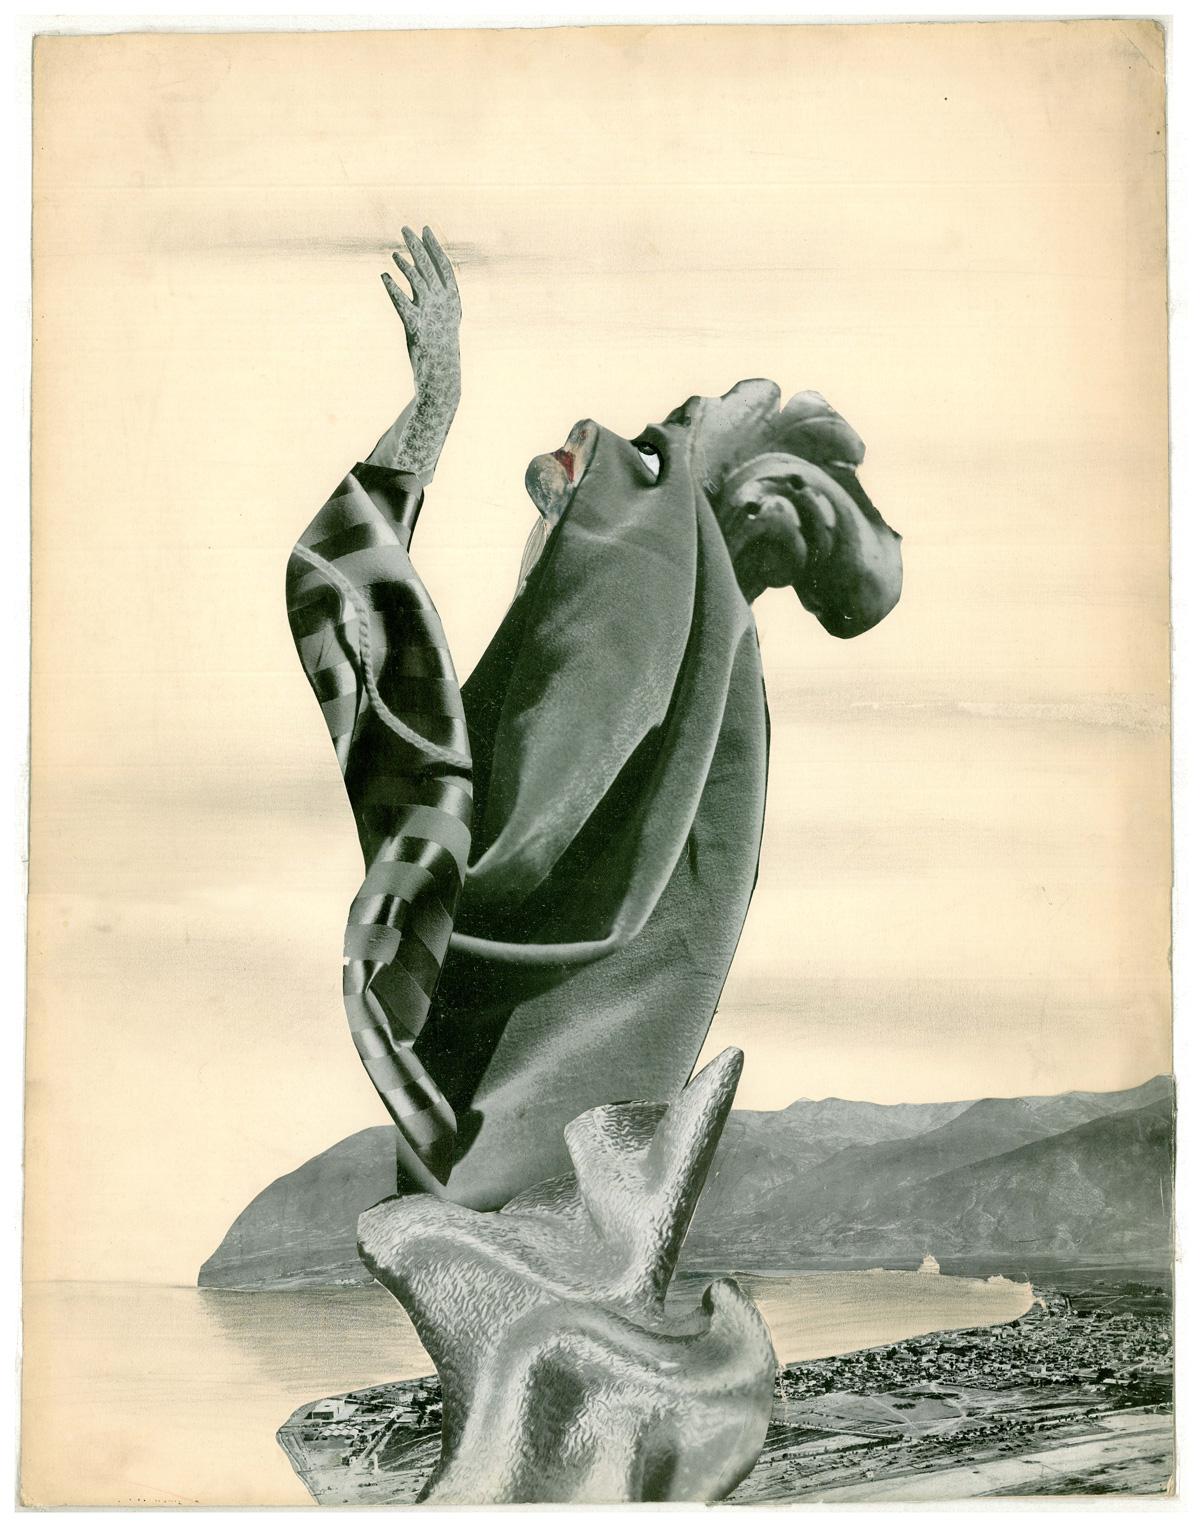 Hedda-Sterne-Feminine-character-17-x-48-cm